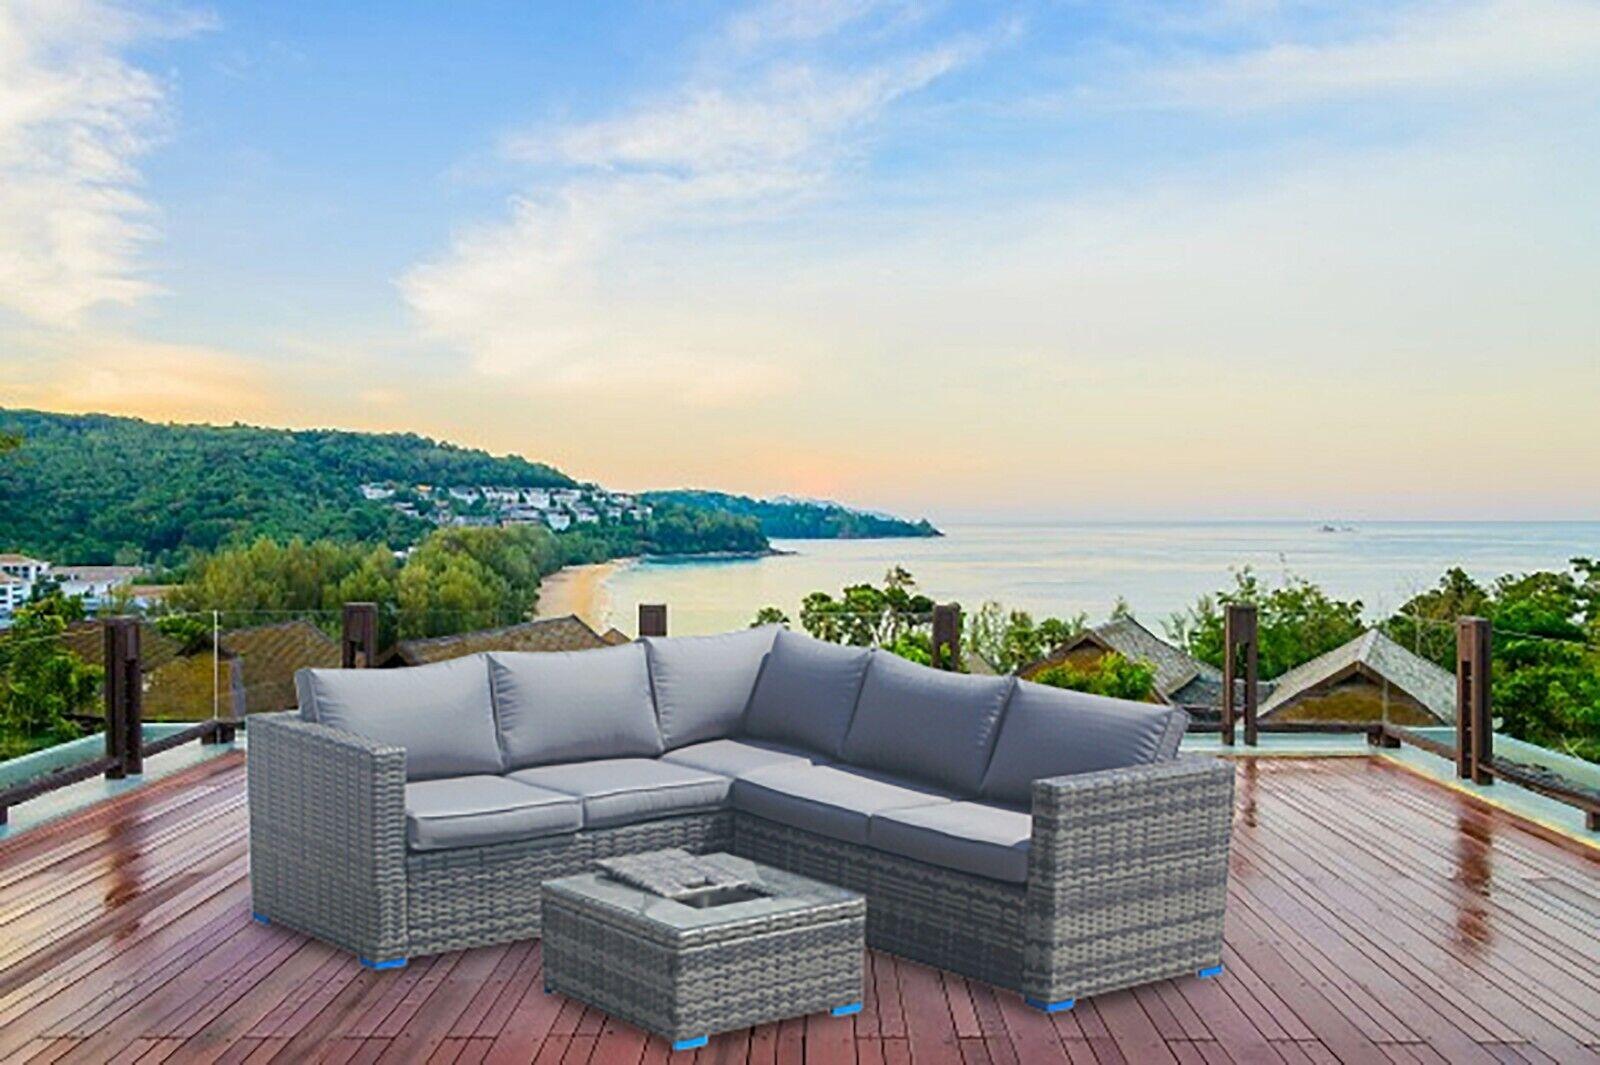 Garden Furniture - Outdoor Rattan Garden Furniture Corner Sofa Patio Lounge Grey With Ice Bucket